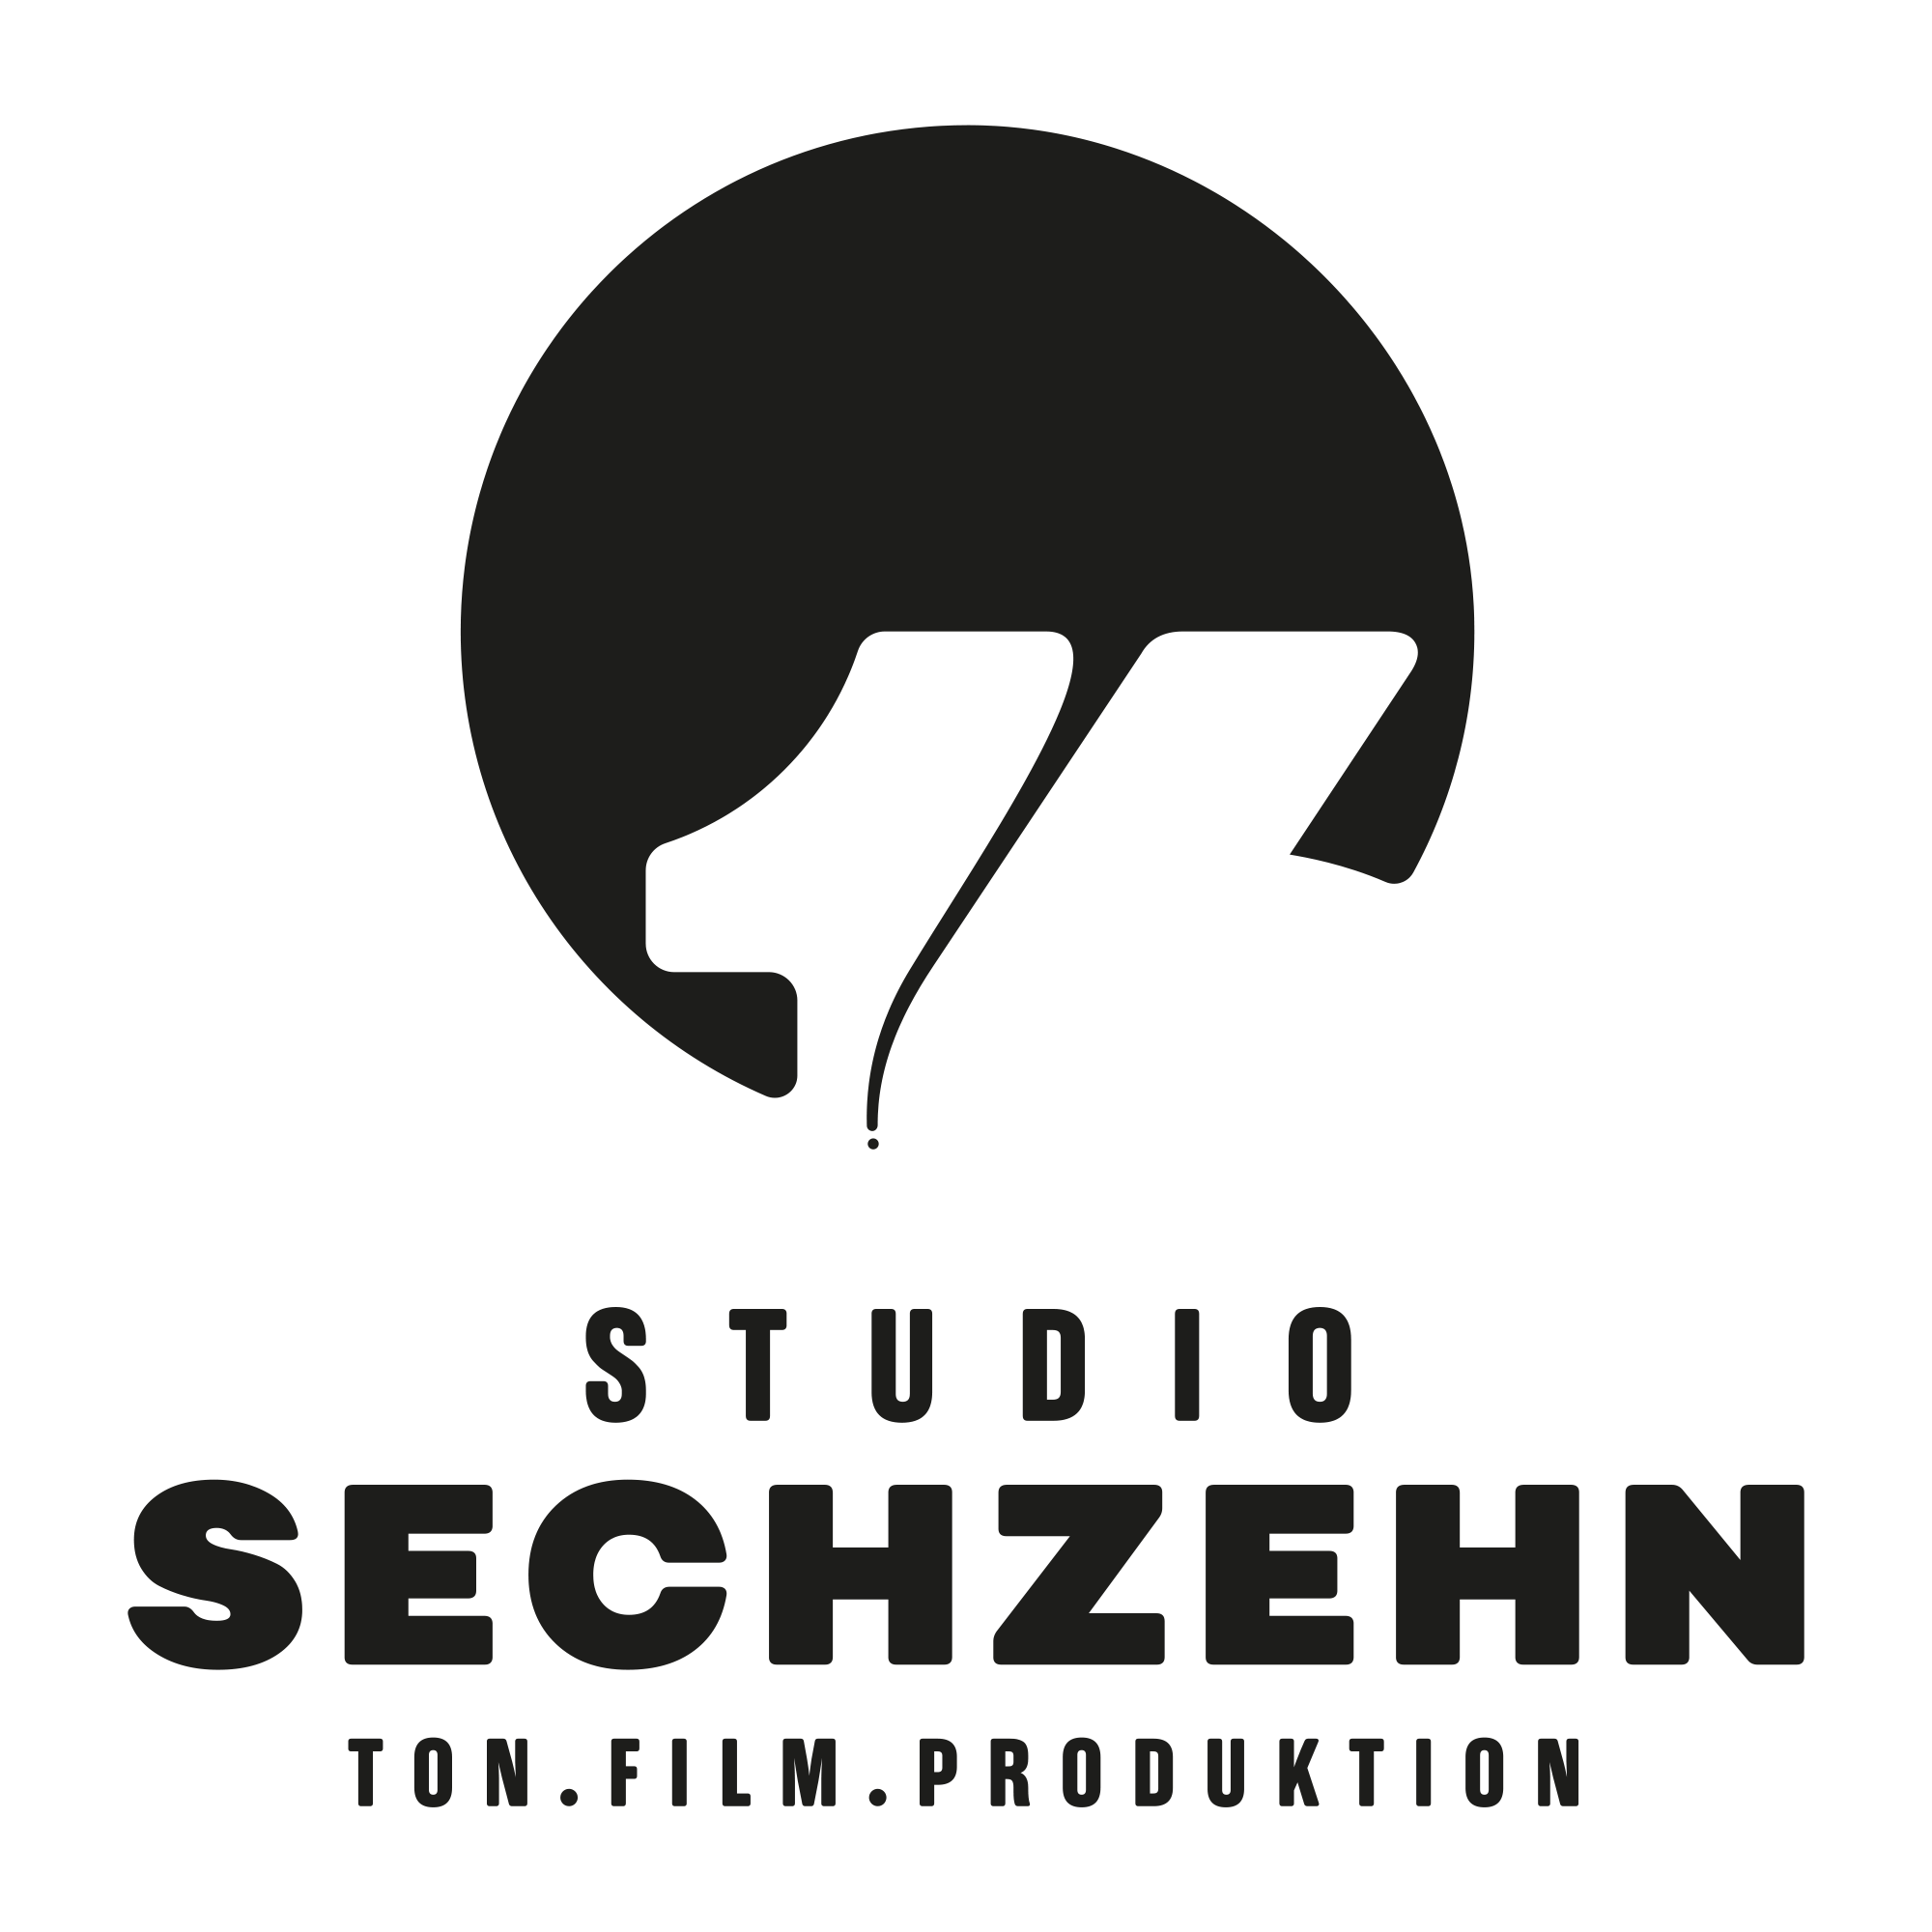 STUDIO SECHZEHN